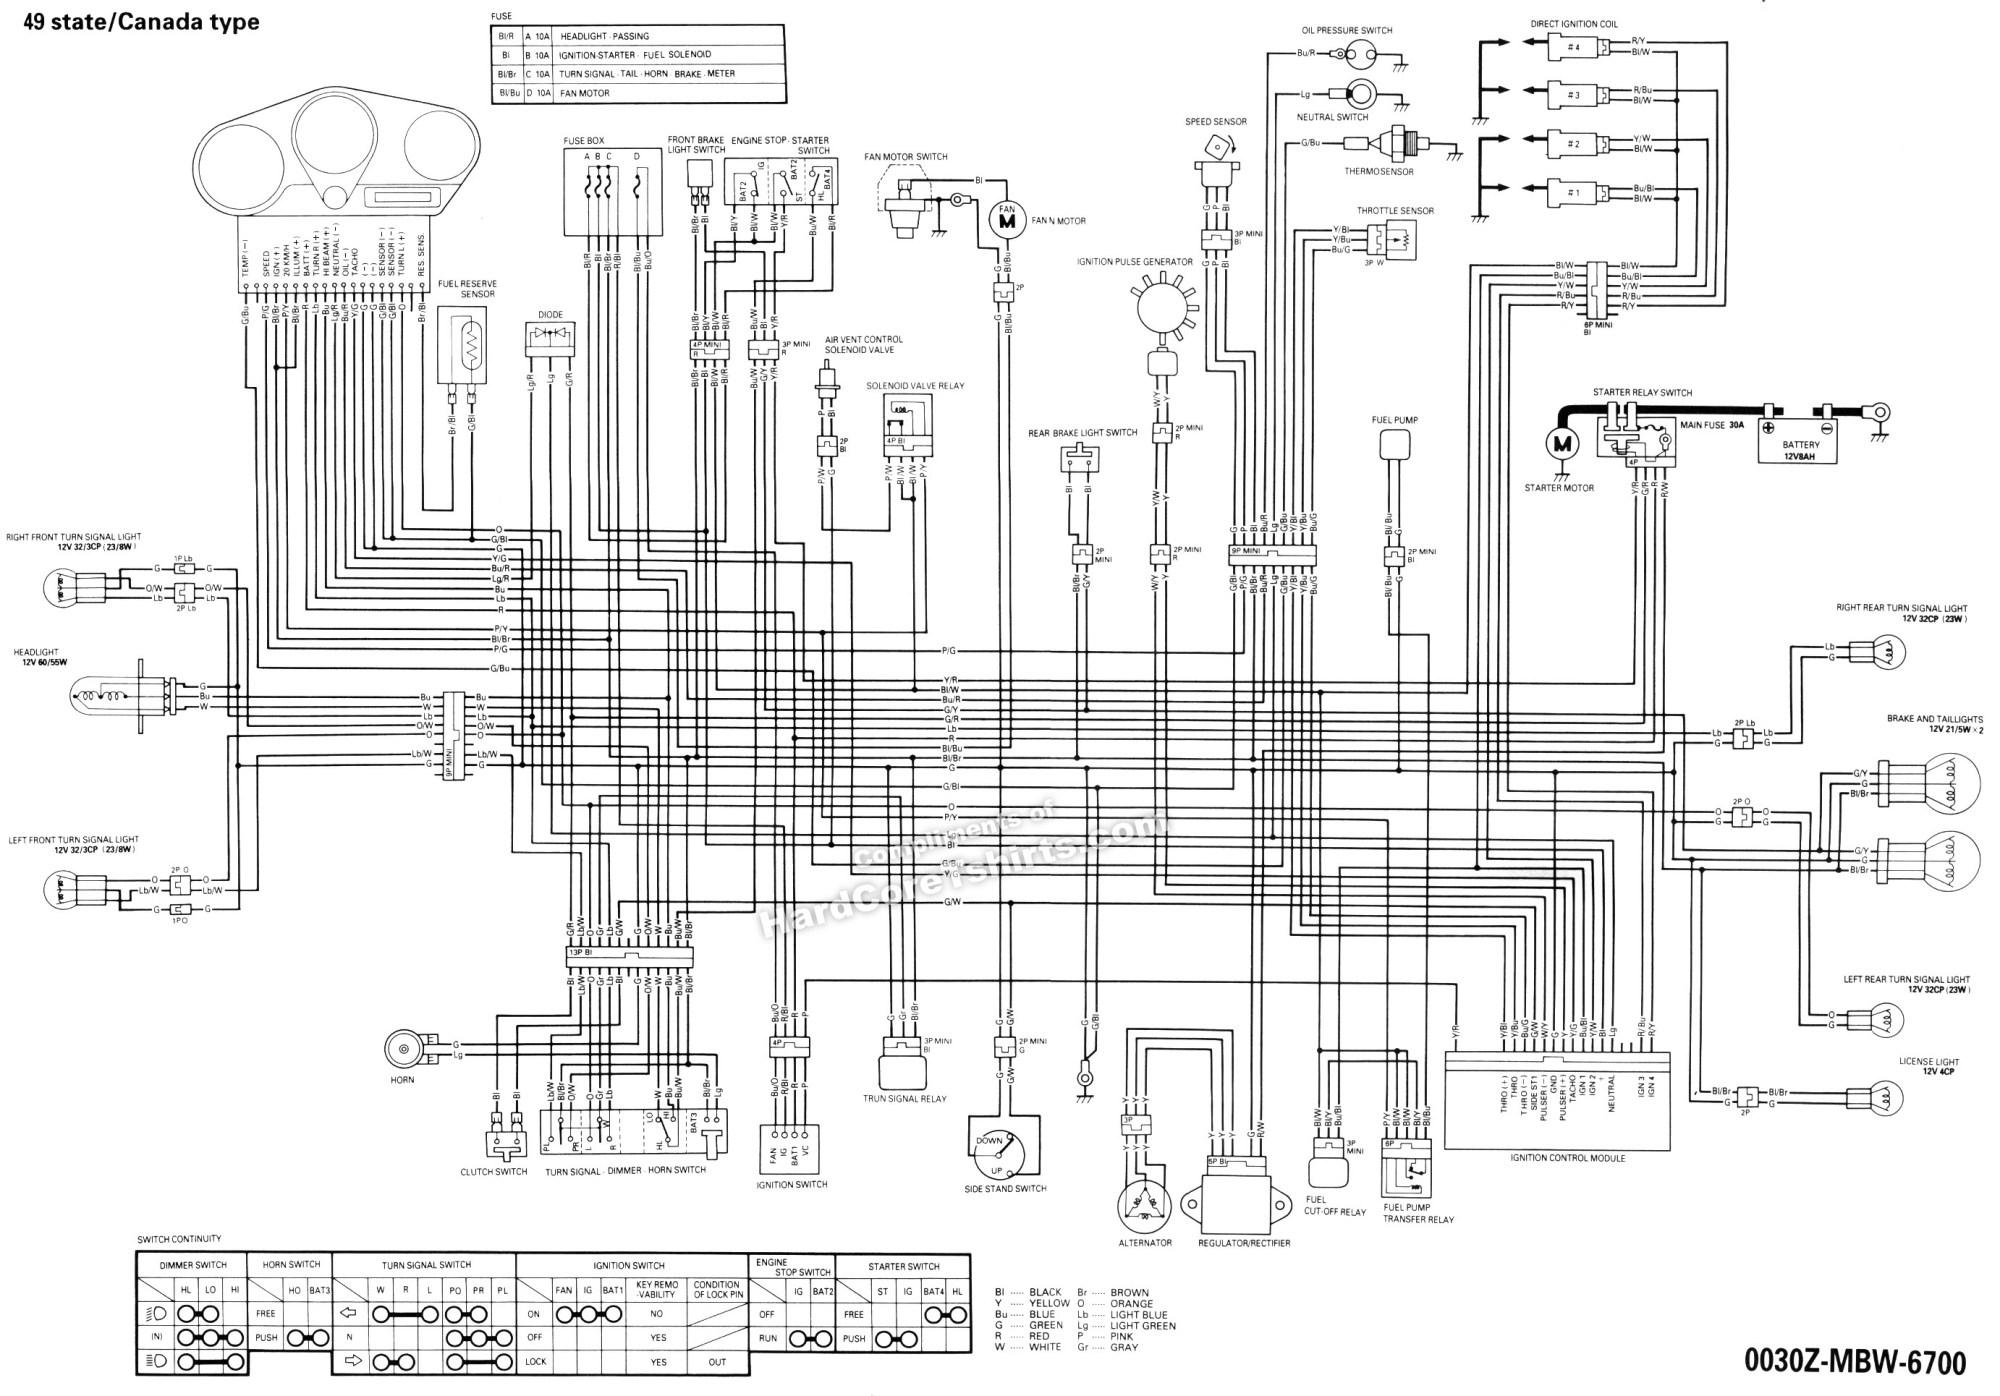 hight resolution of kawasaki mule kaf620 wiring diagram kawasaki free wiring kawasaki 550 mule electrical schematic kawasaki mule 3010 electrical schematic